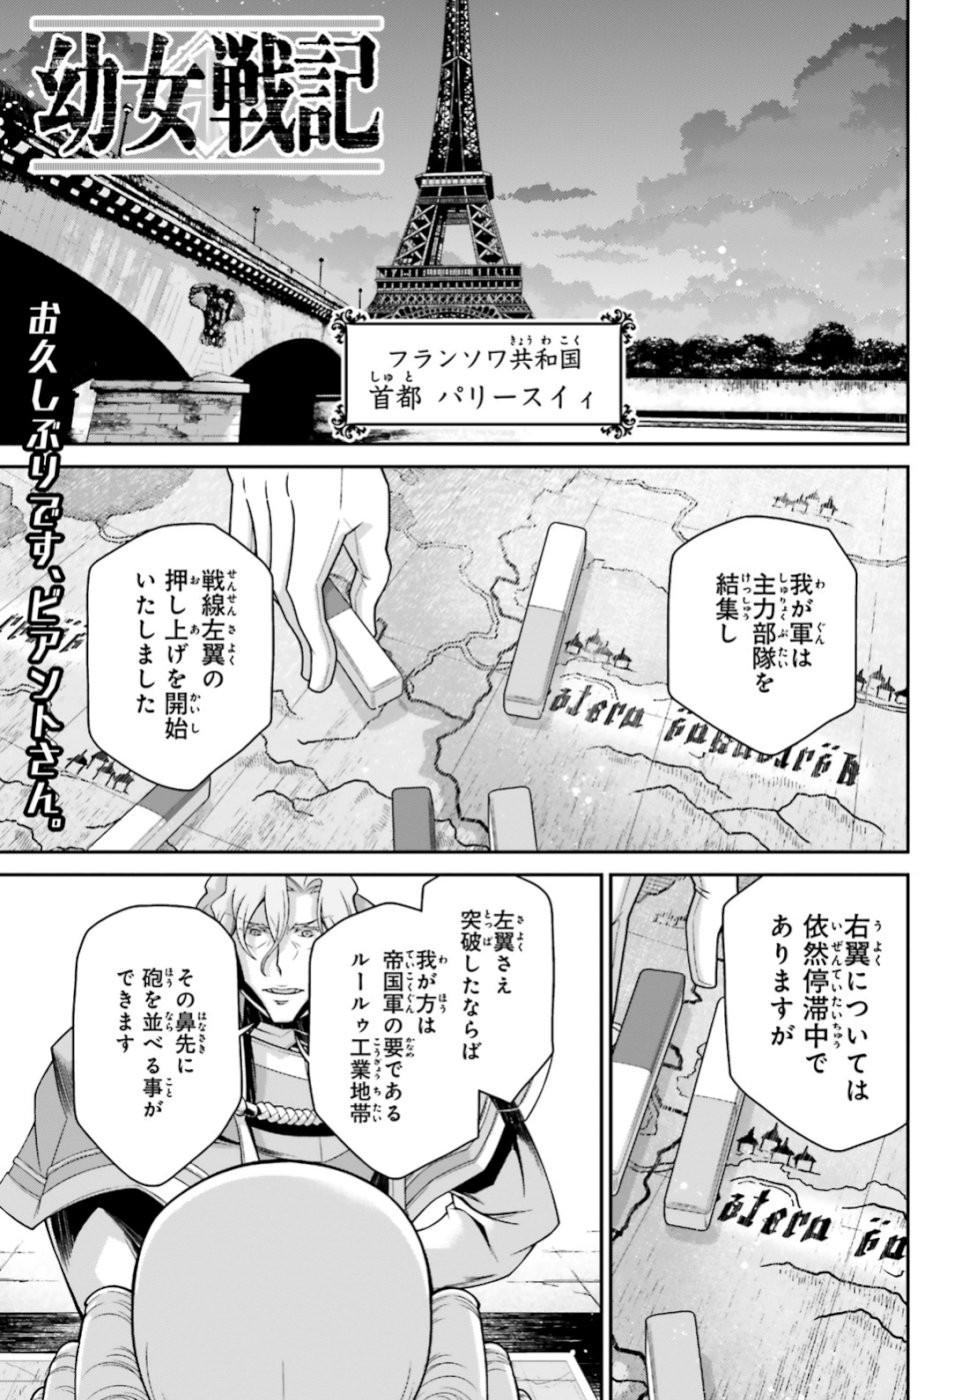 Youjo Senki - Chapter 45 - Page 1